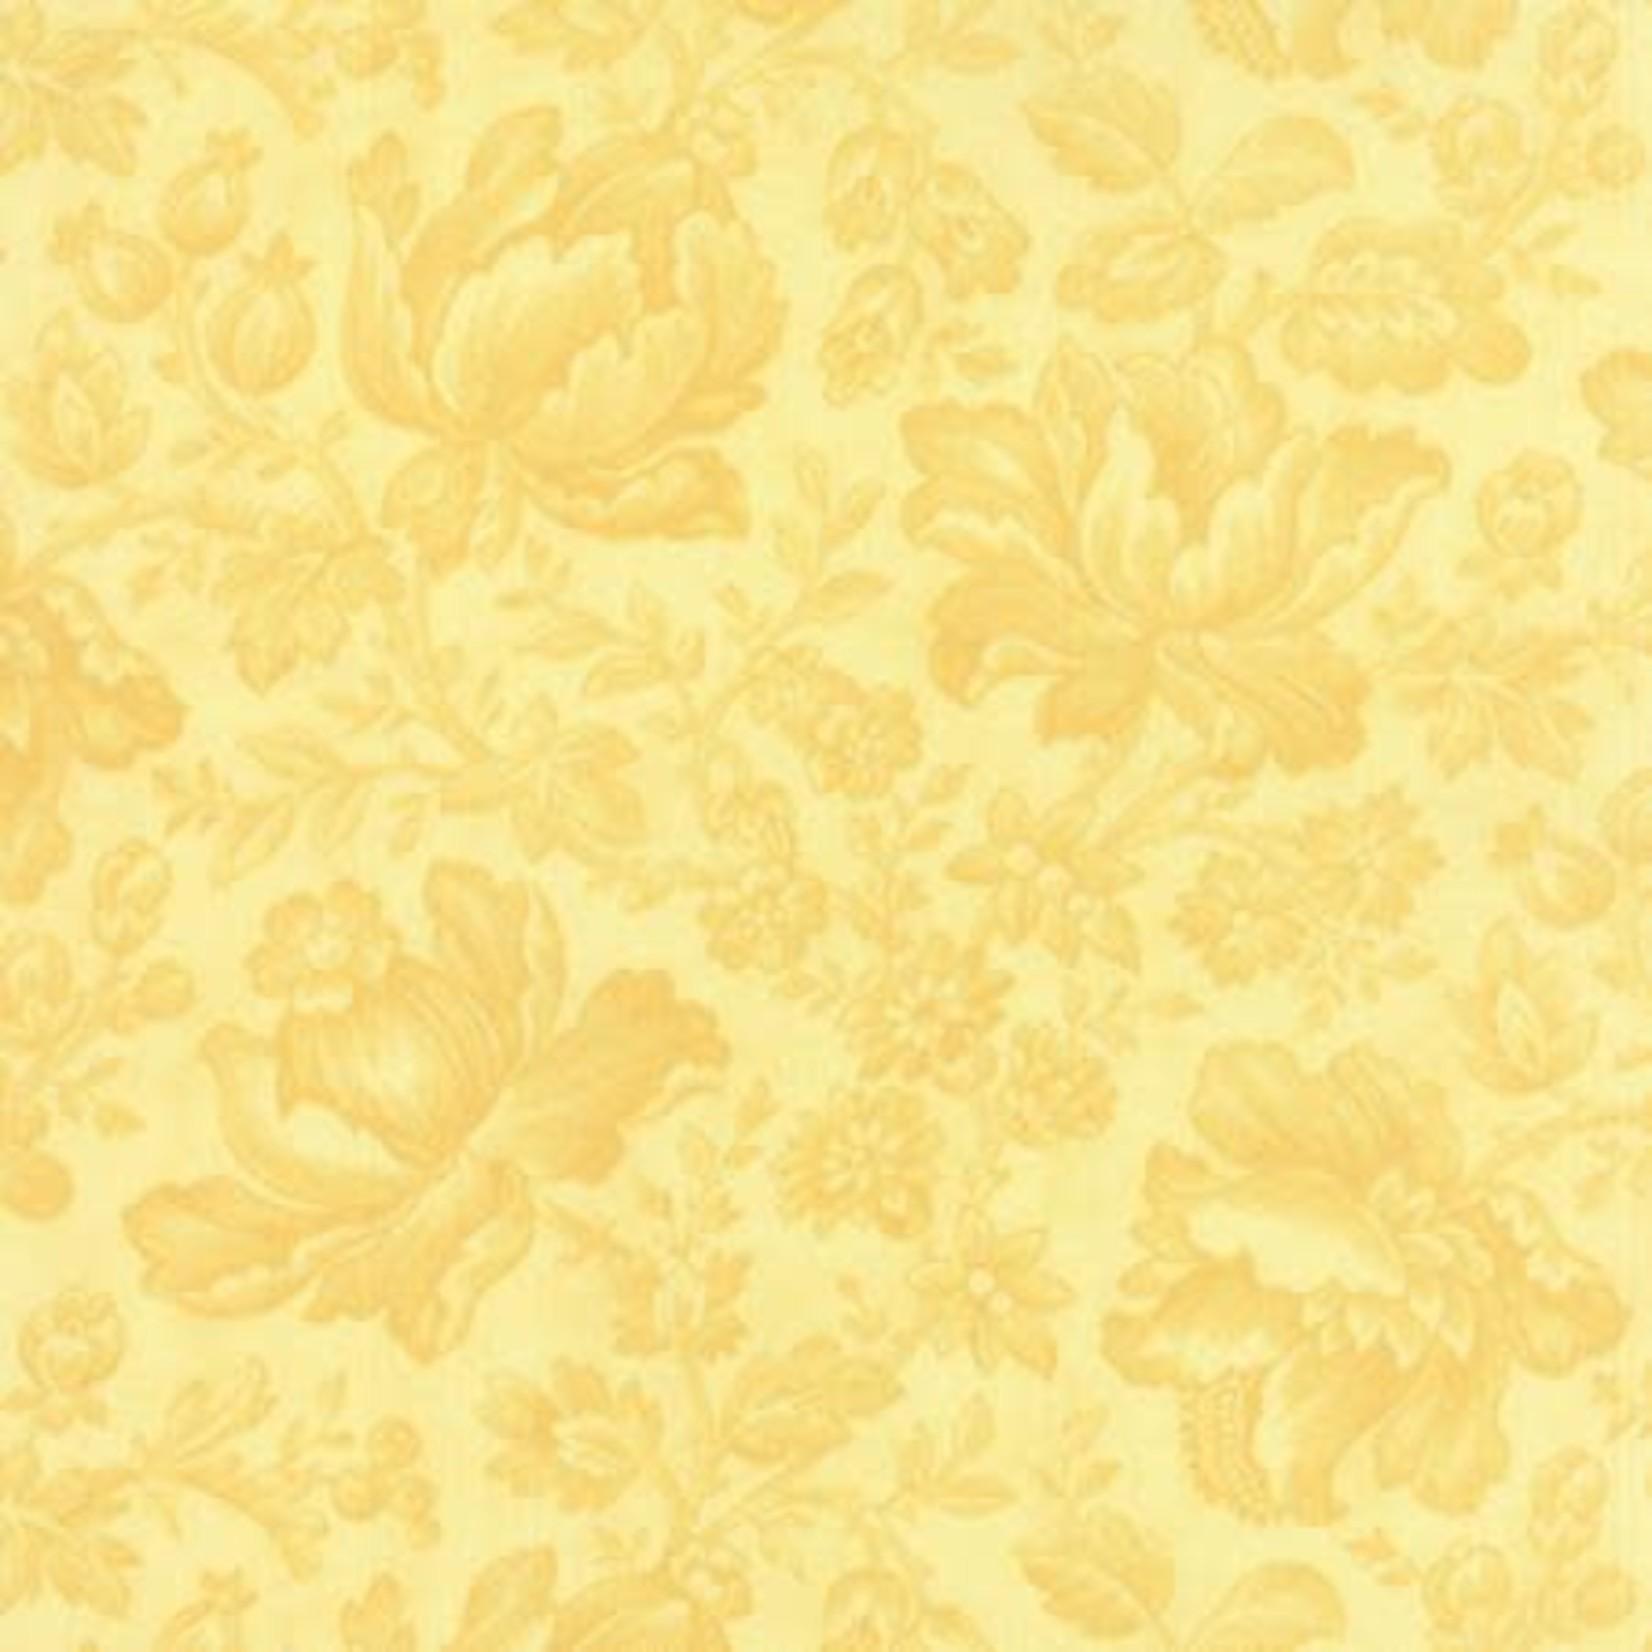 Moda 3 Sisters - Whitewashed Cottage - Daffodil